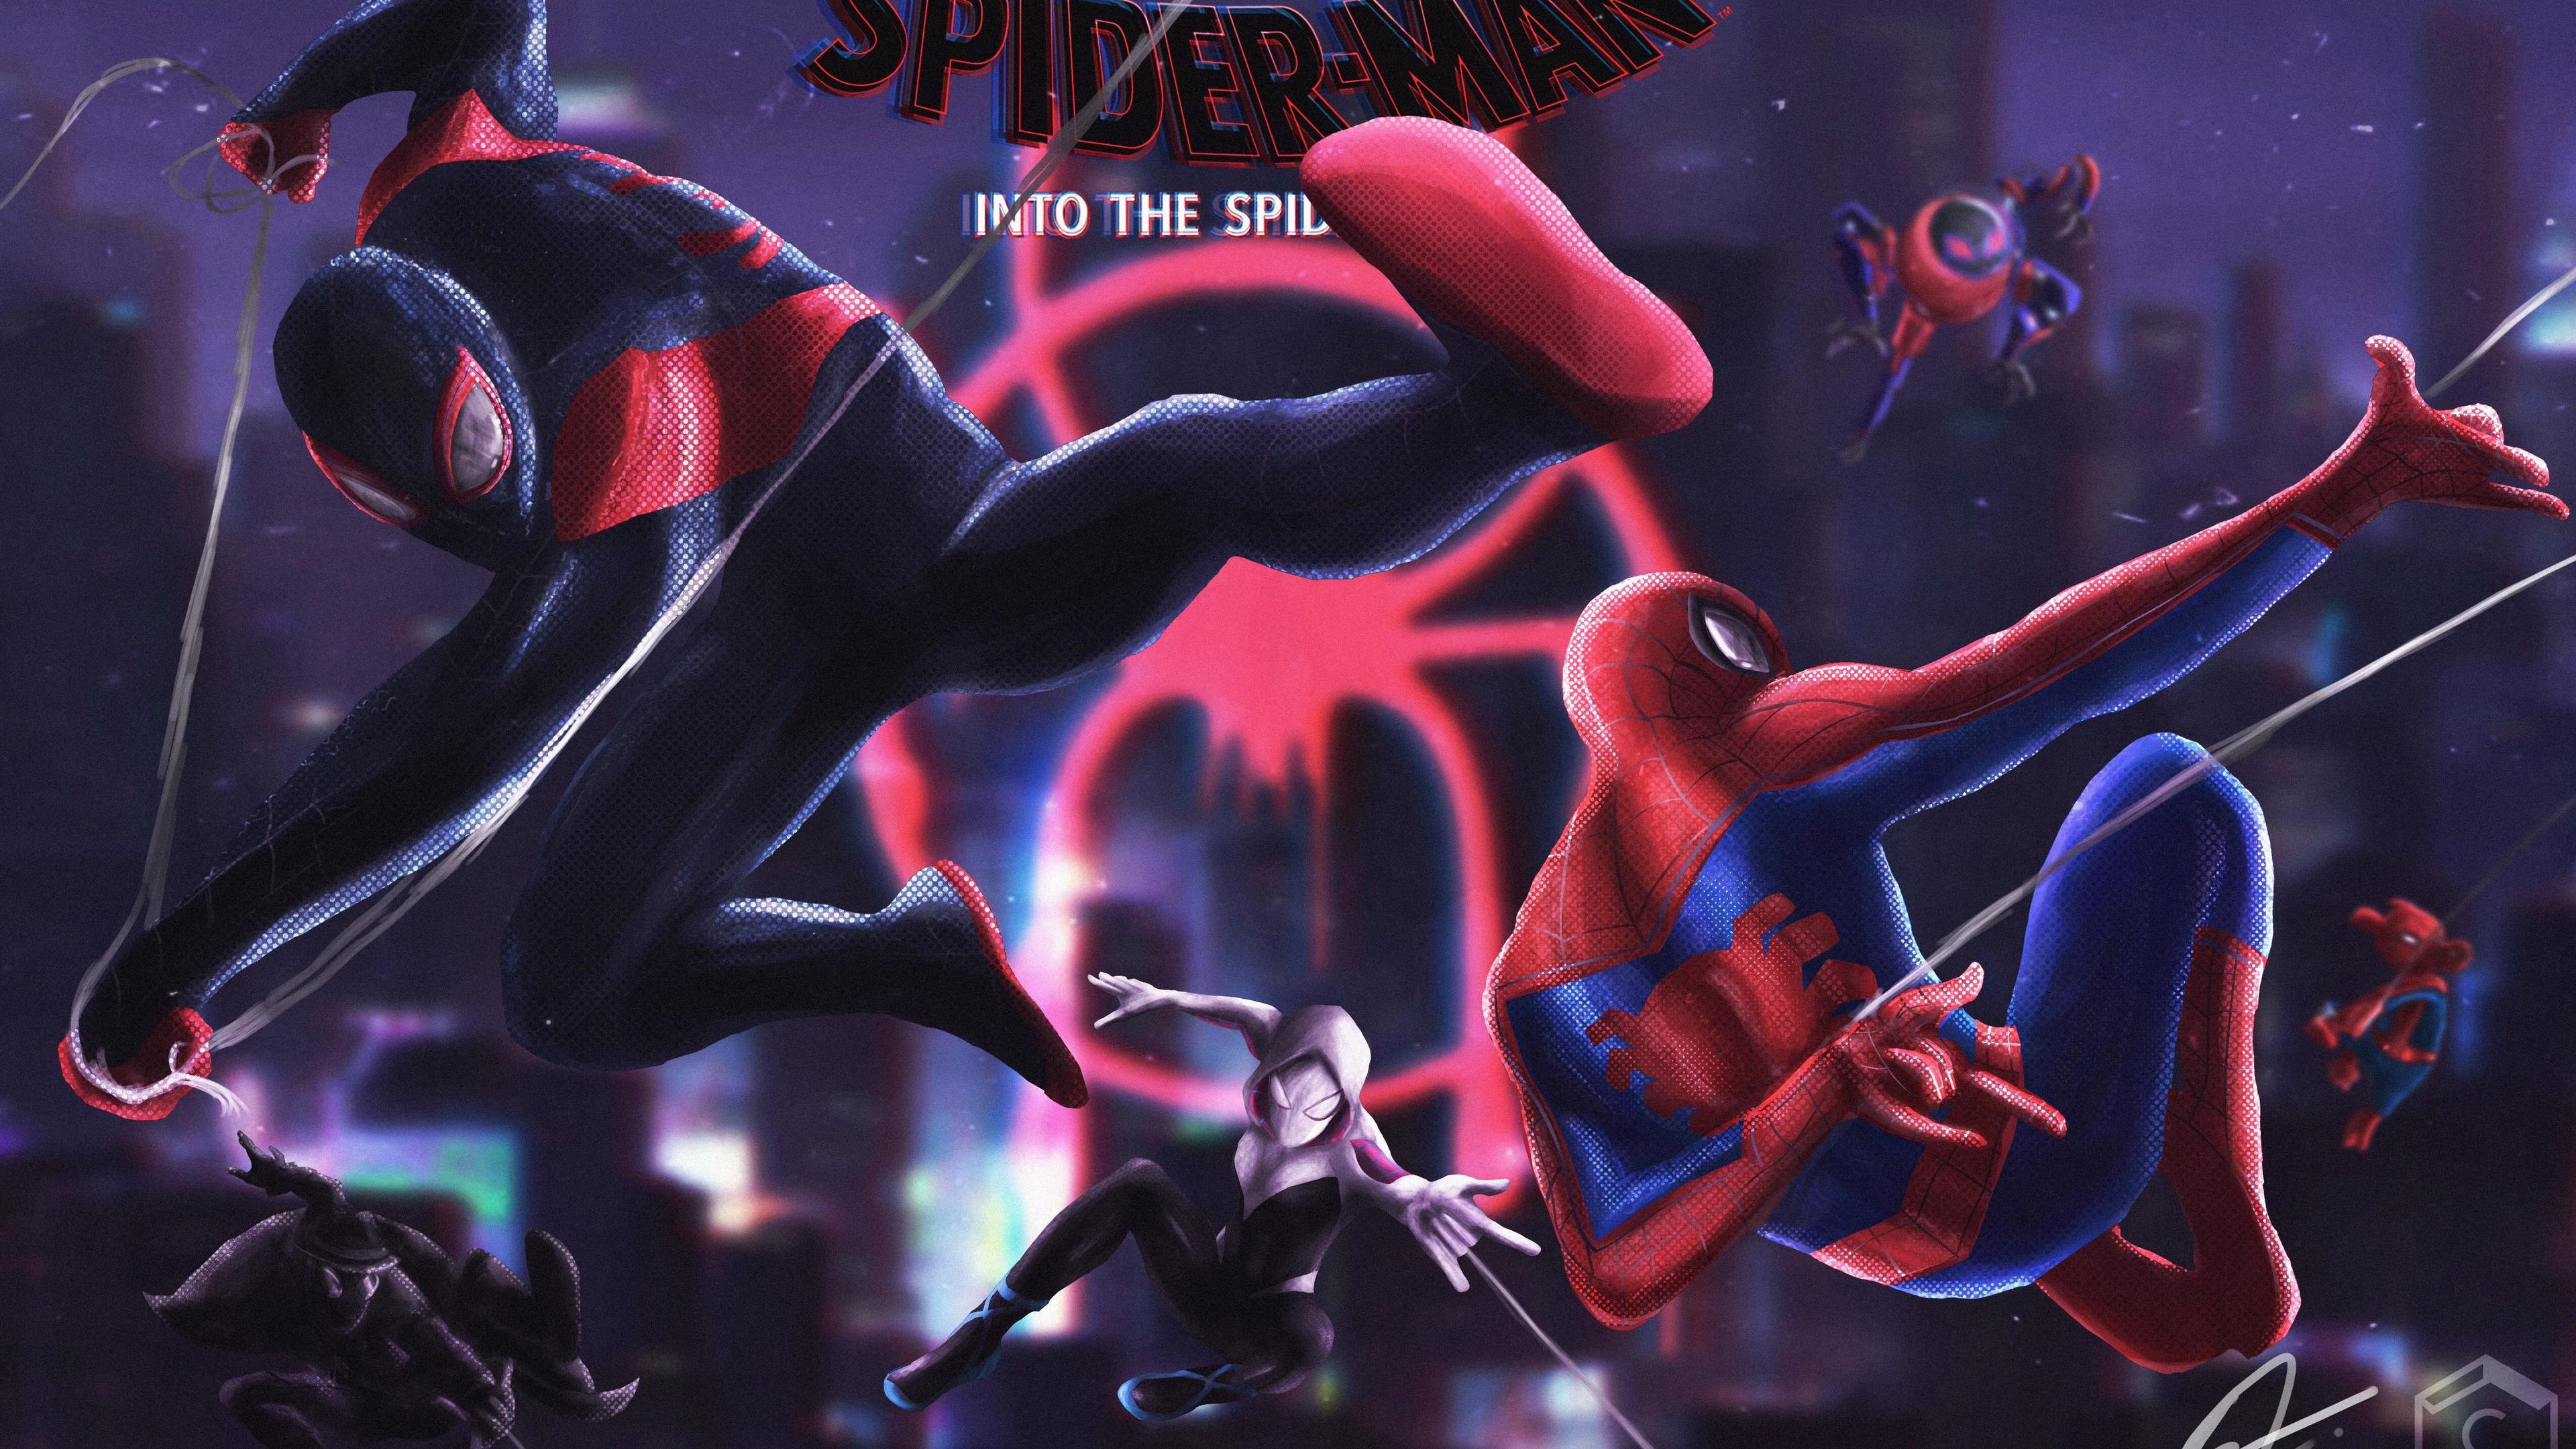 spider verse artwork 4k 1553072041 - Spider Verse Artwork 4k - superheroes wallpapers, spiderman wallpapers, spiderman into the spider verse wallpapers, hd-wallpapers, 5k wallpapers, 4k-wallpapers